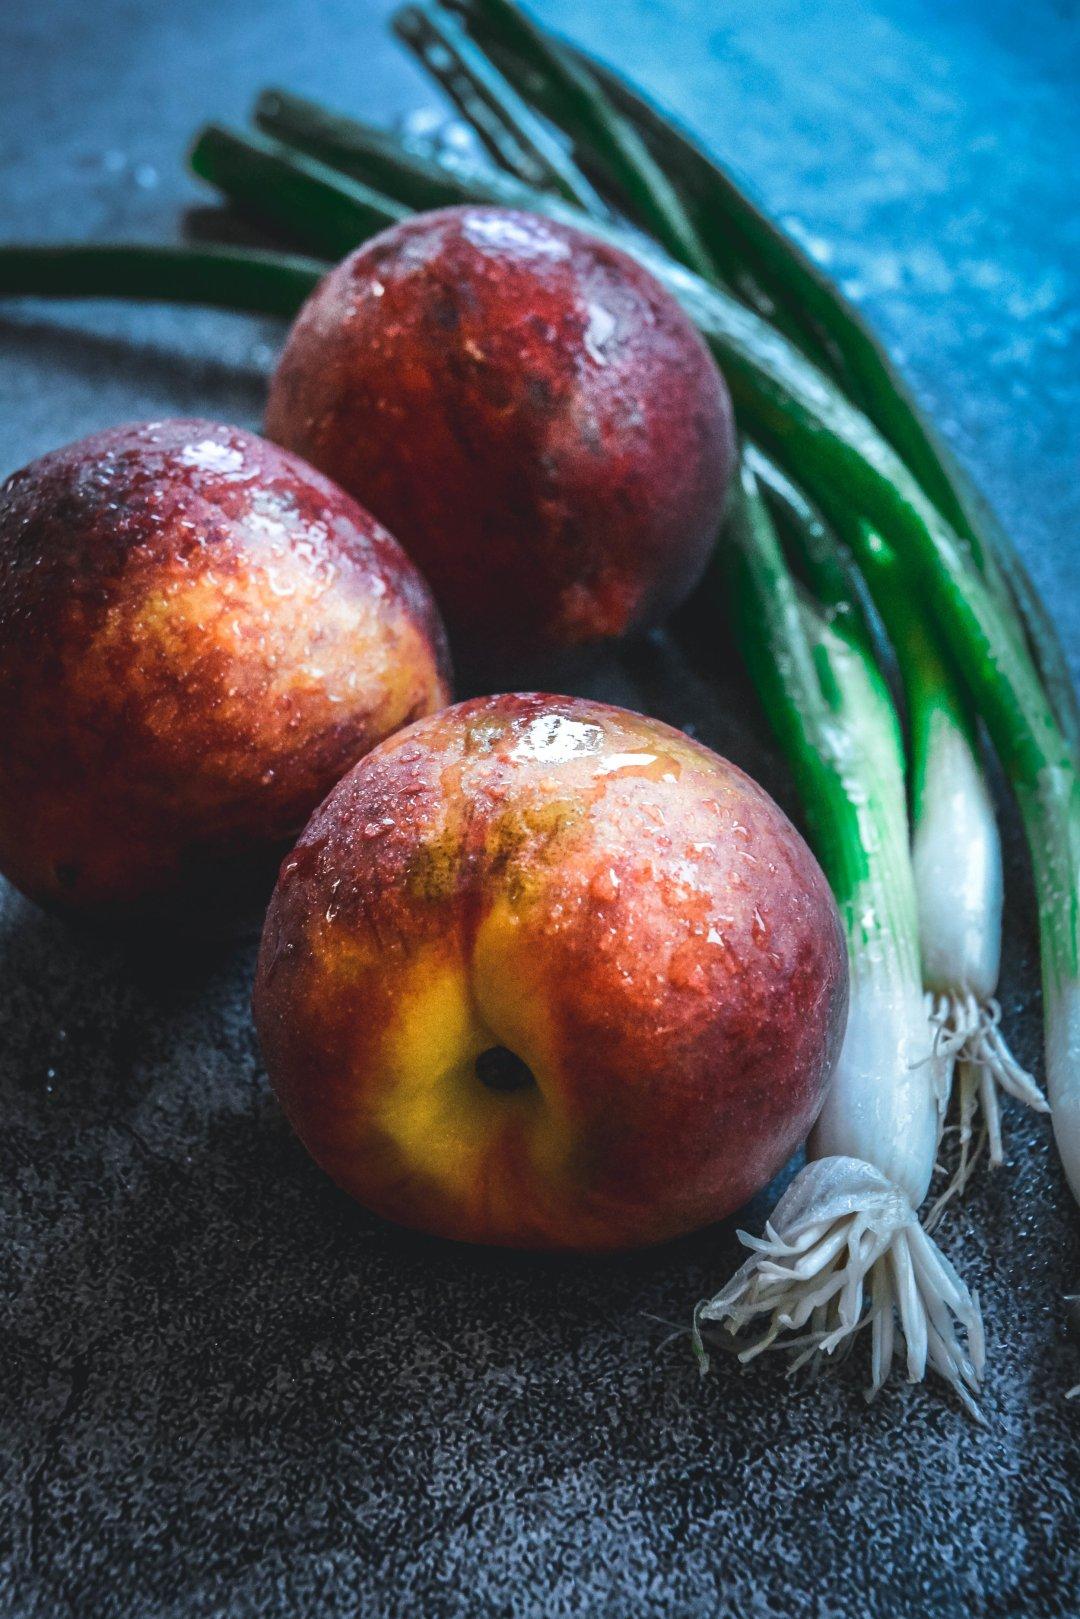 scallions and peaches